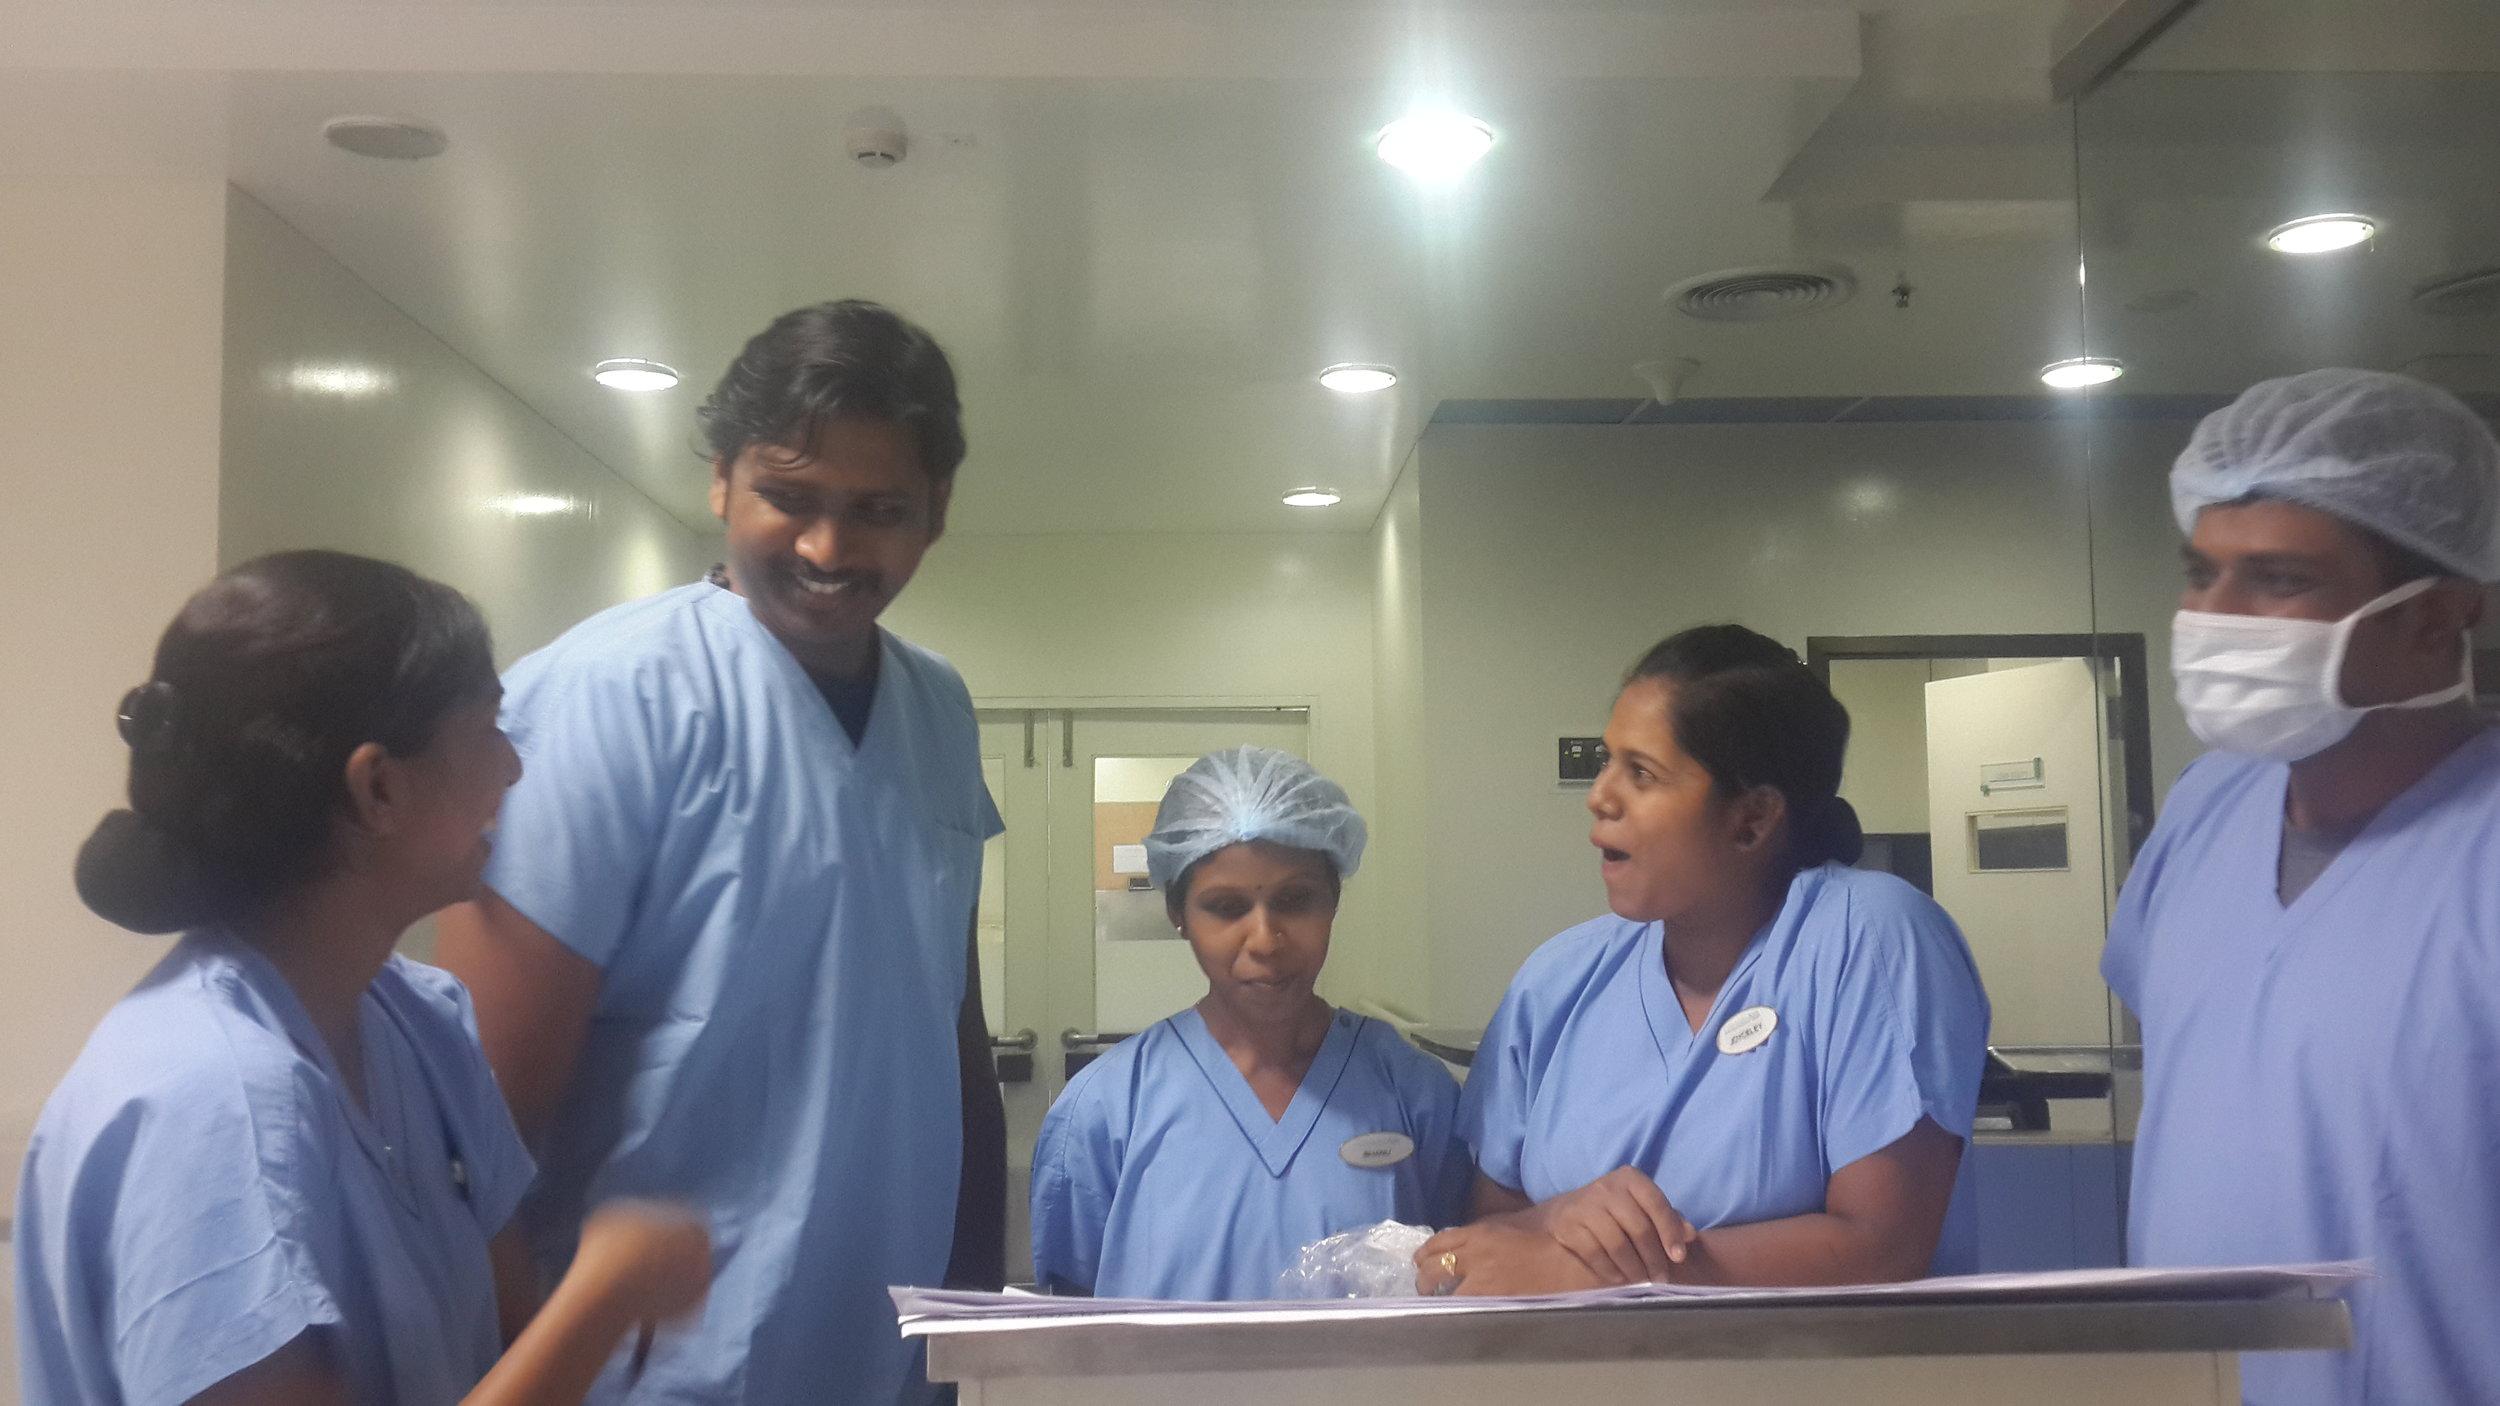 The nurses!